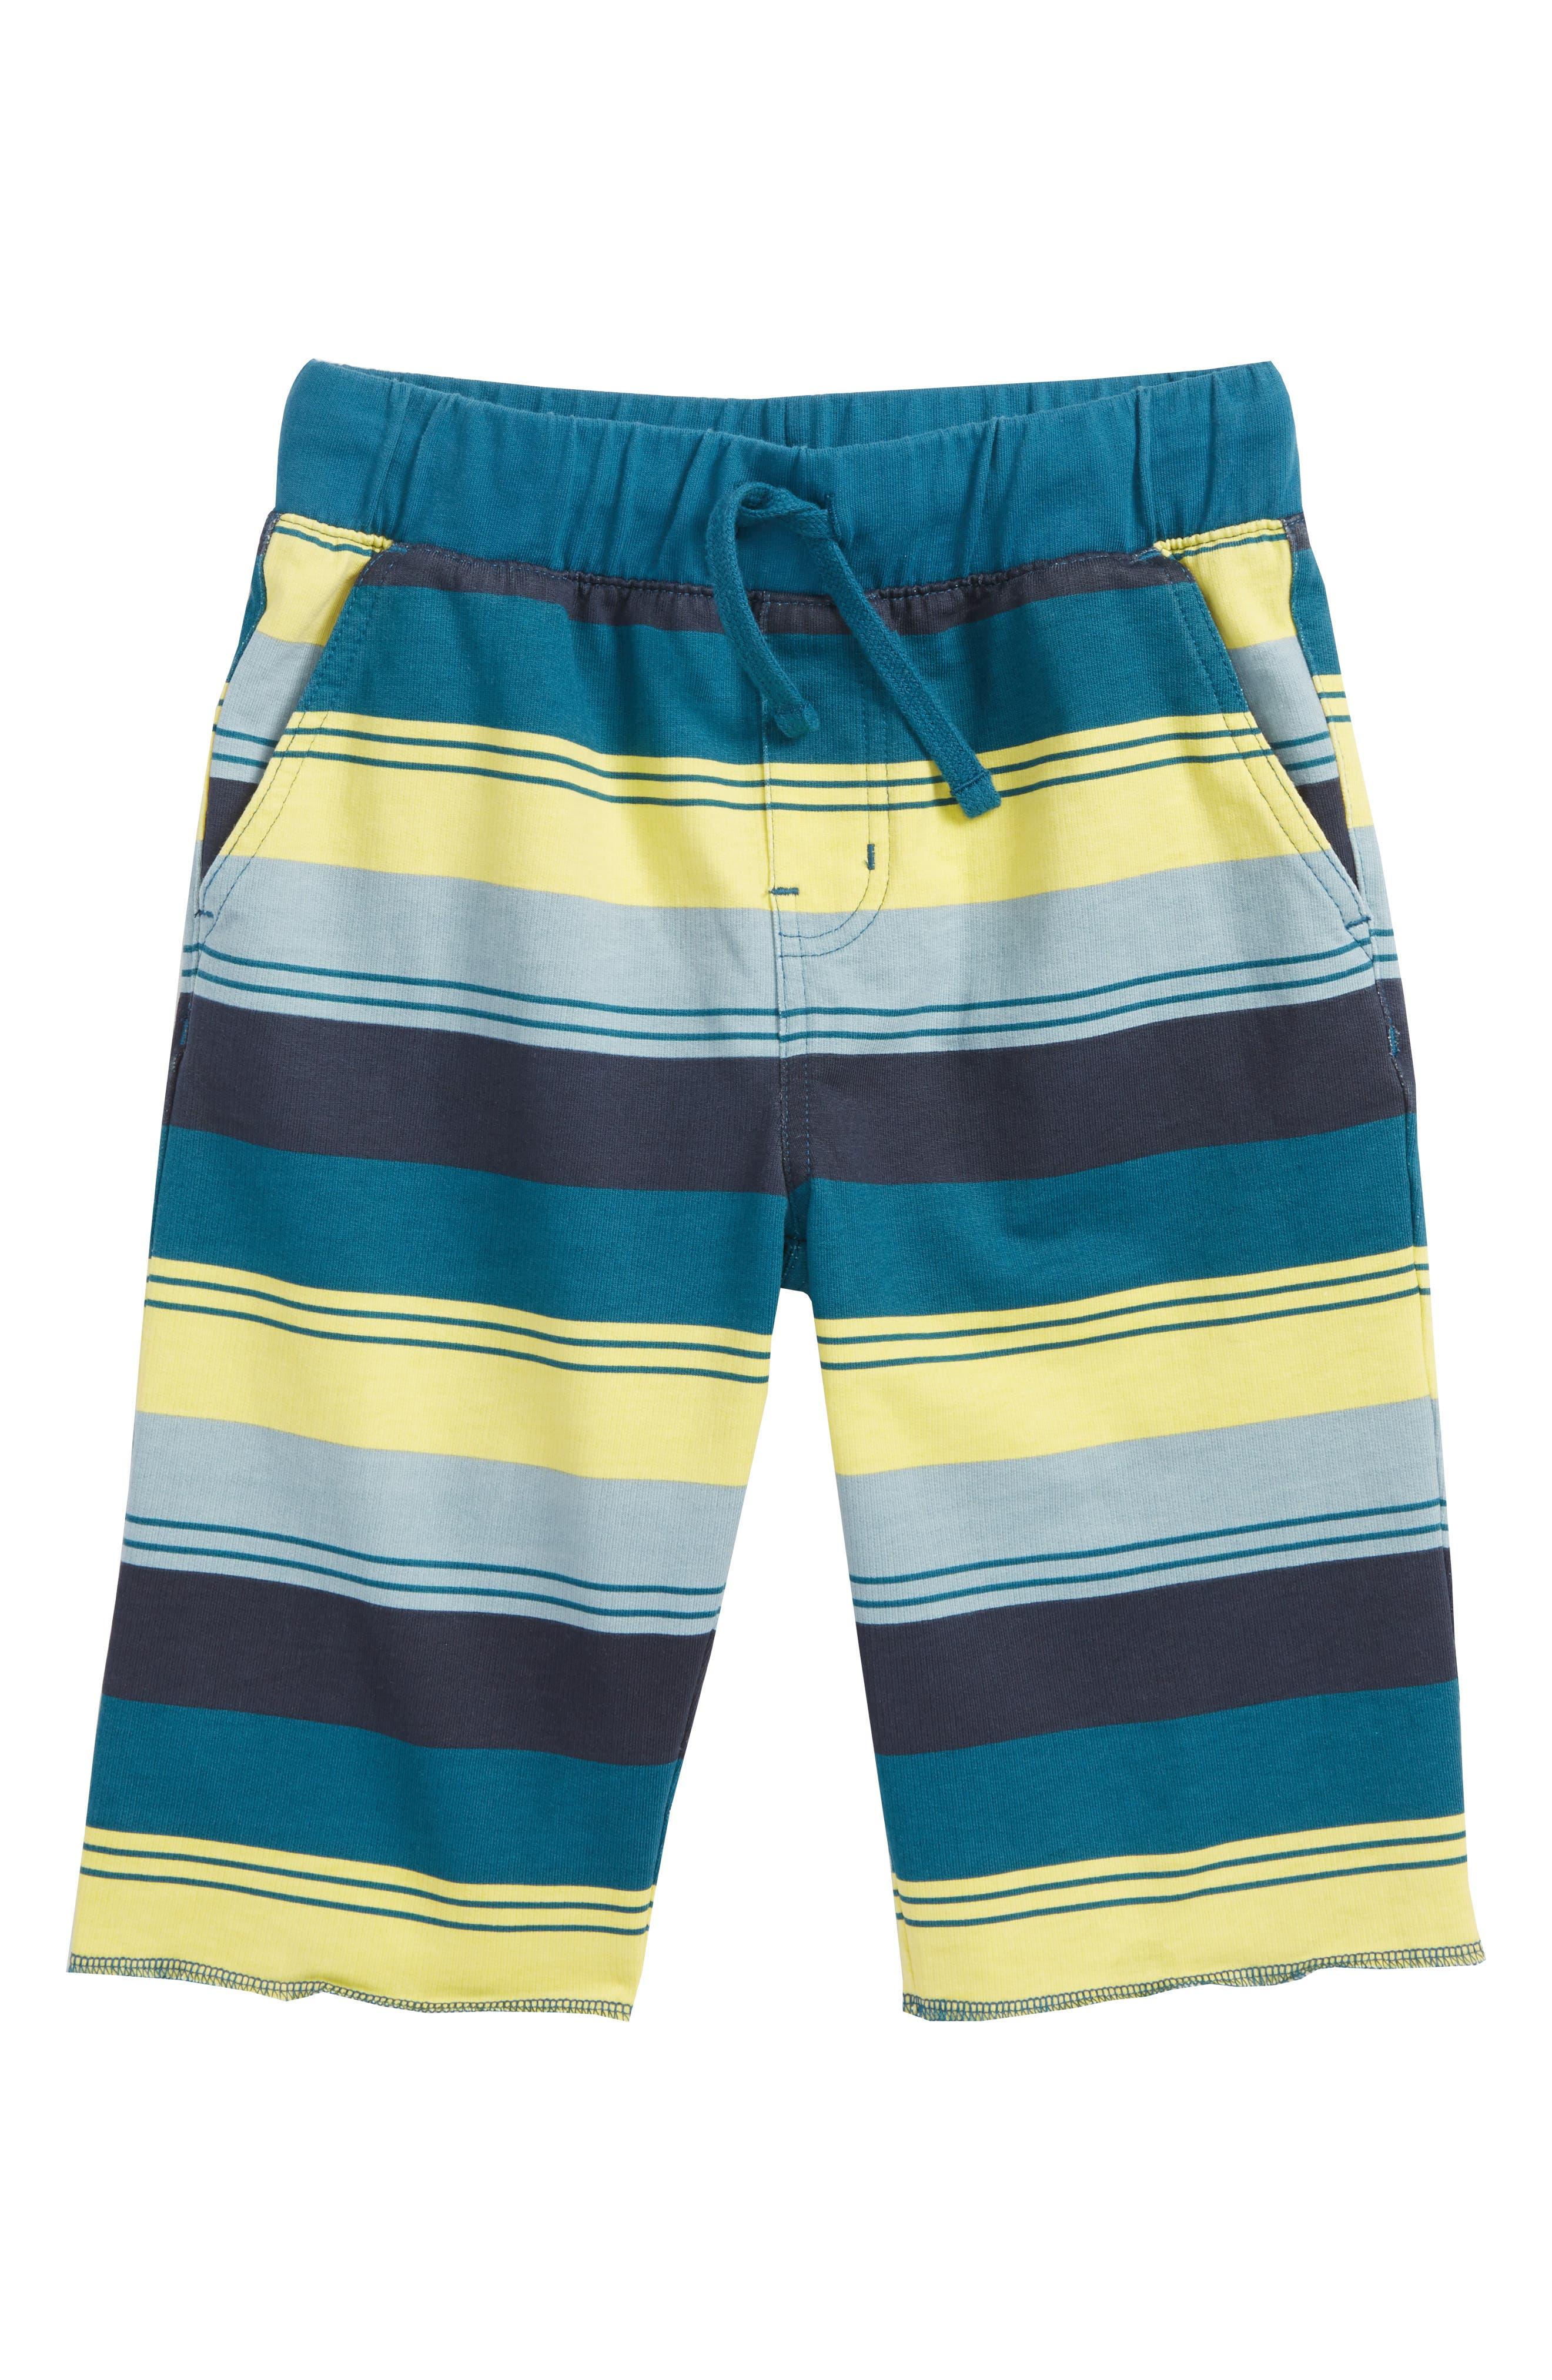 Cruiser Print Shorts,                             Main thumbnail 1, color,                             Indigo Tri-Stripe